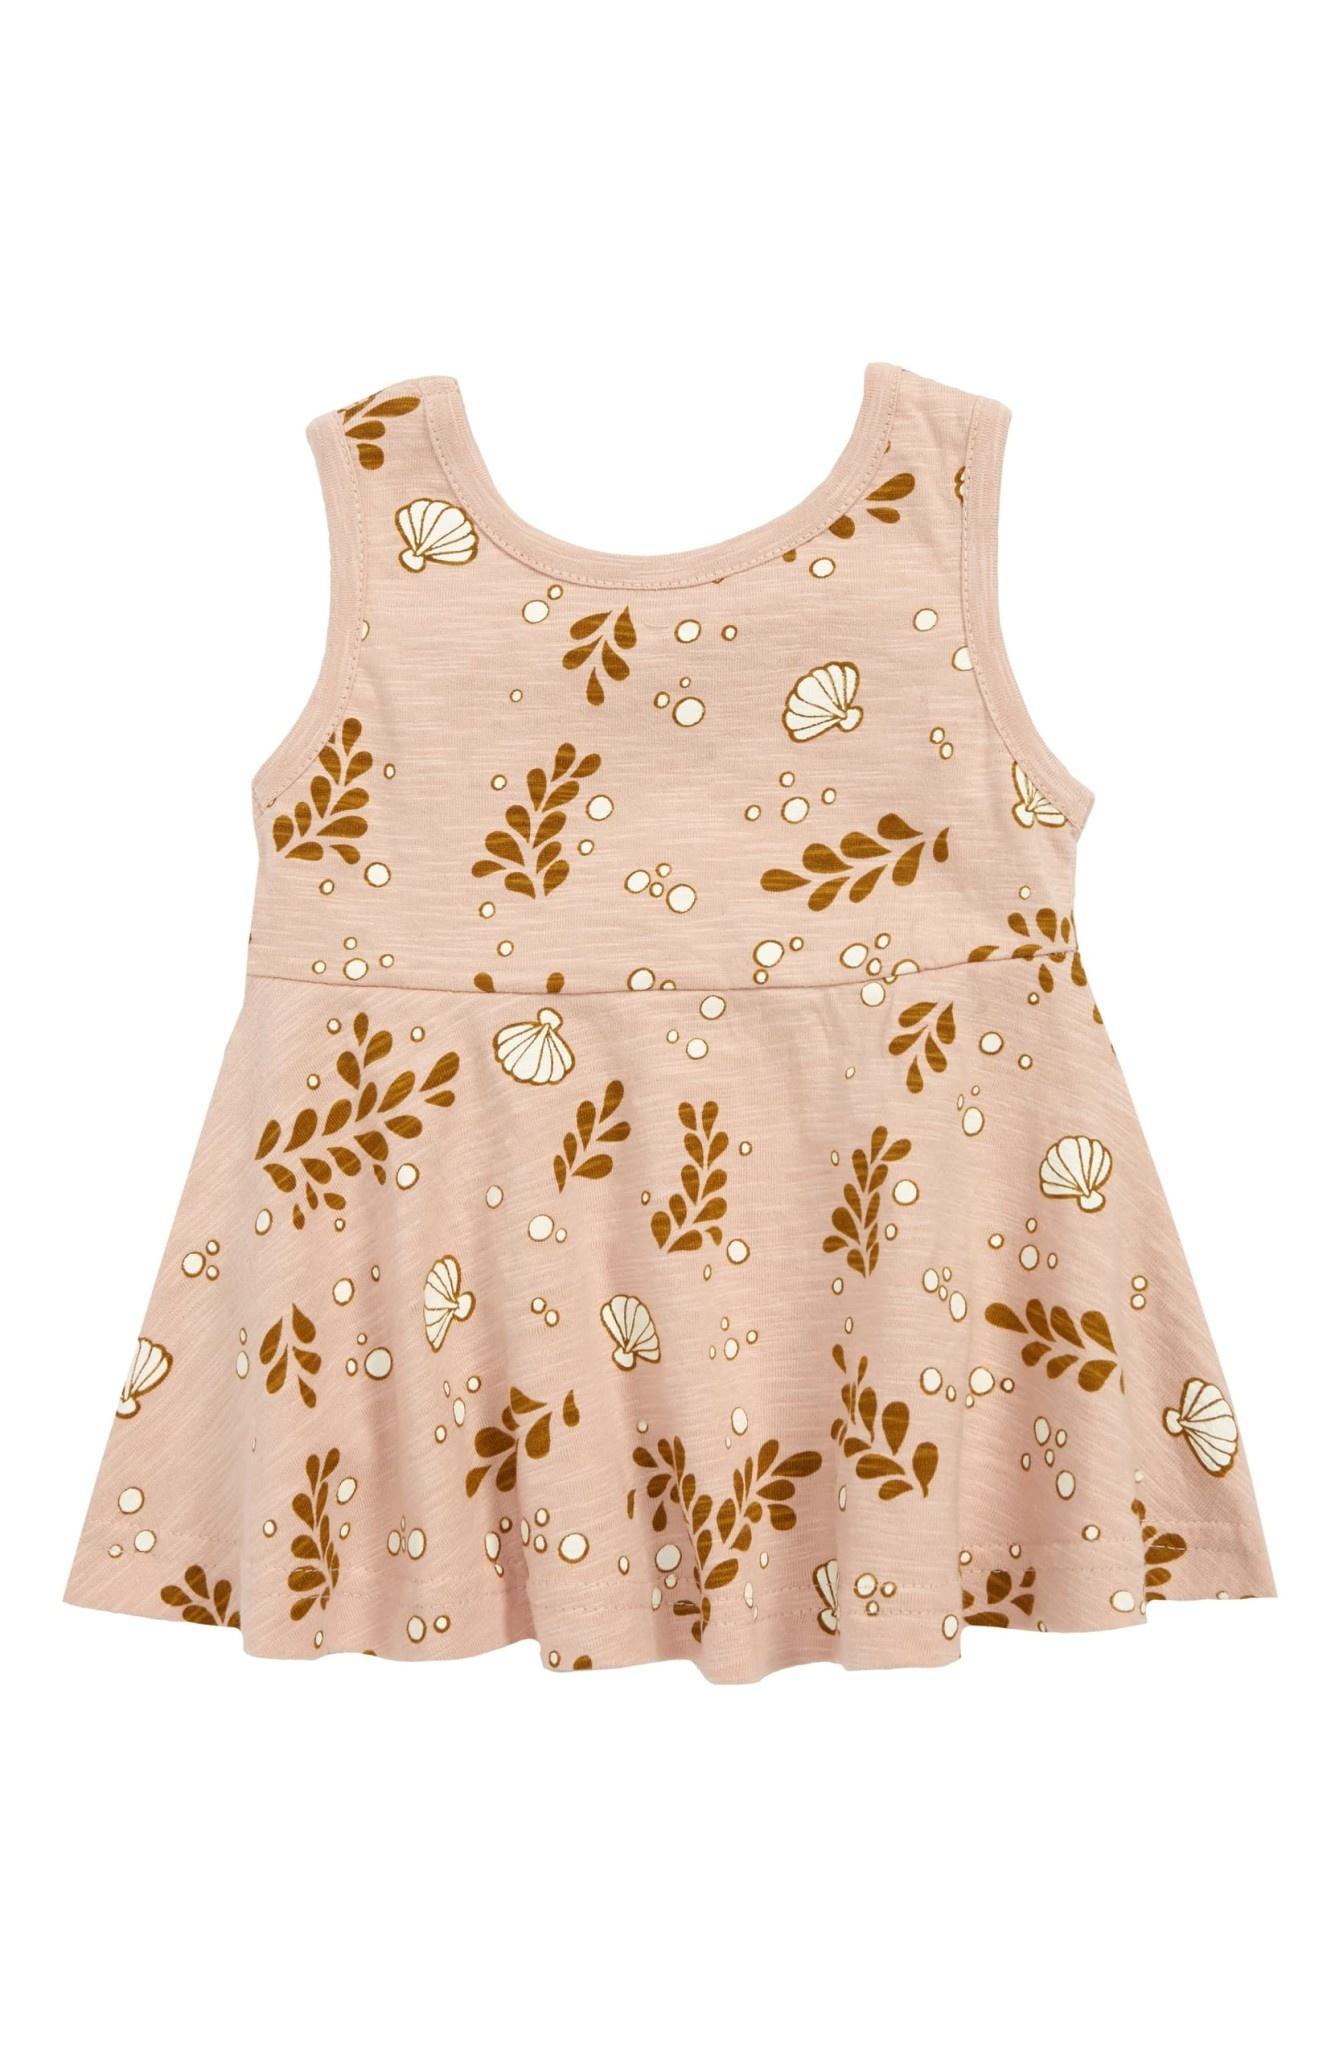 City Mouse Shells Twirl Dress